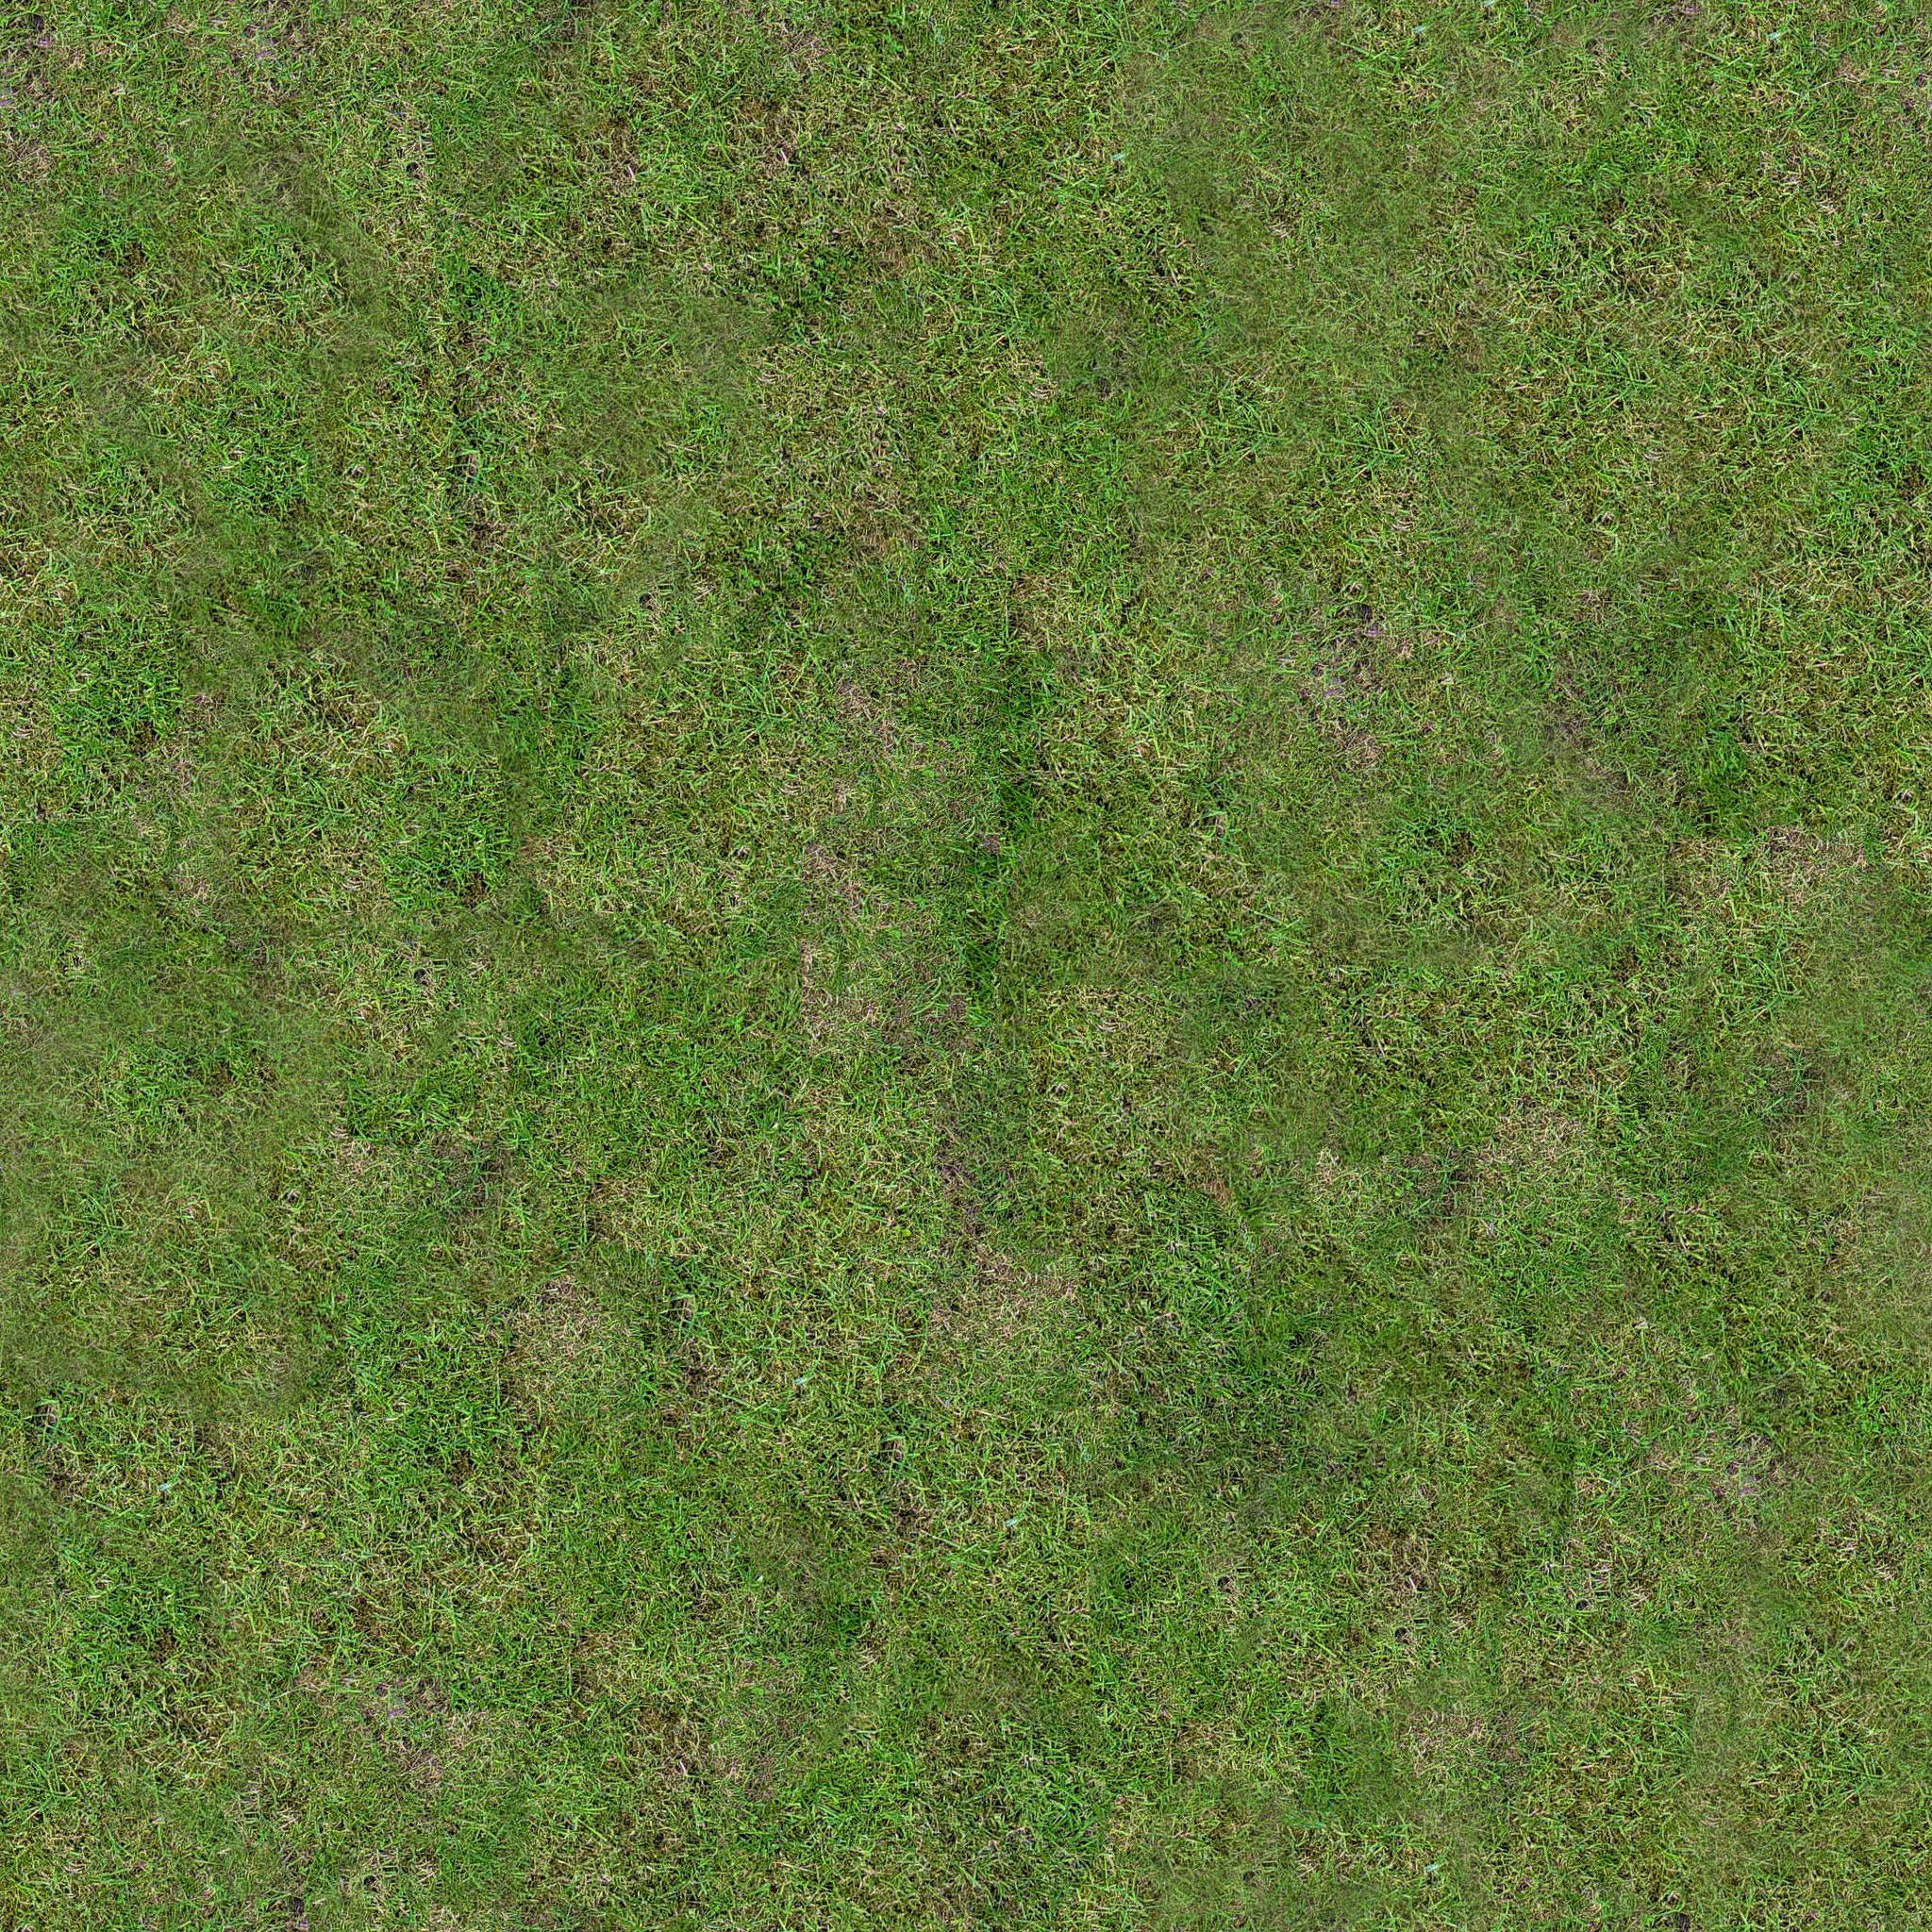 seamless grass texture game. Grass Texture Seamless - Google Search Game